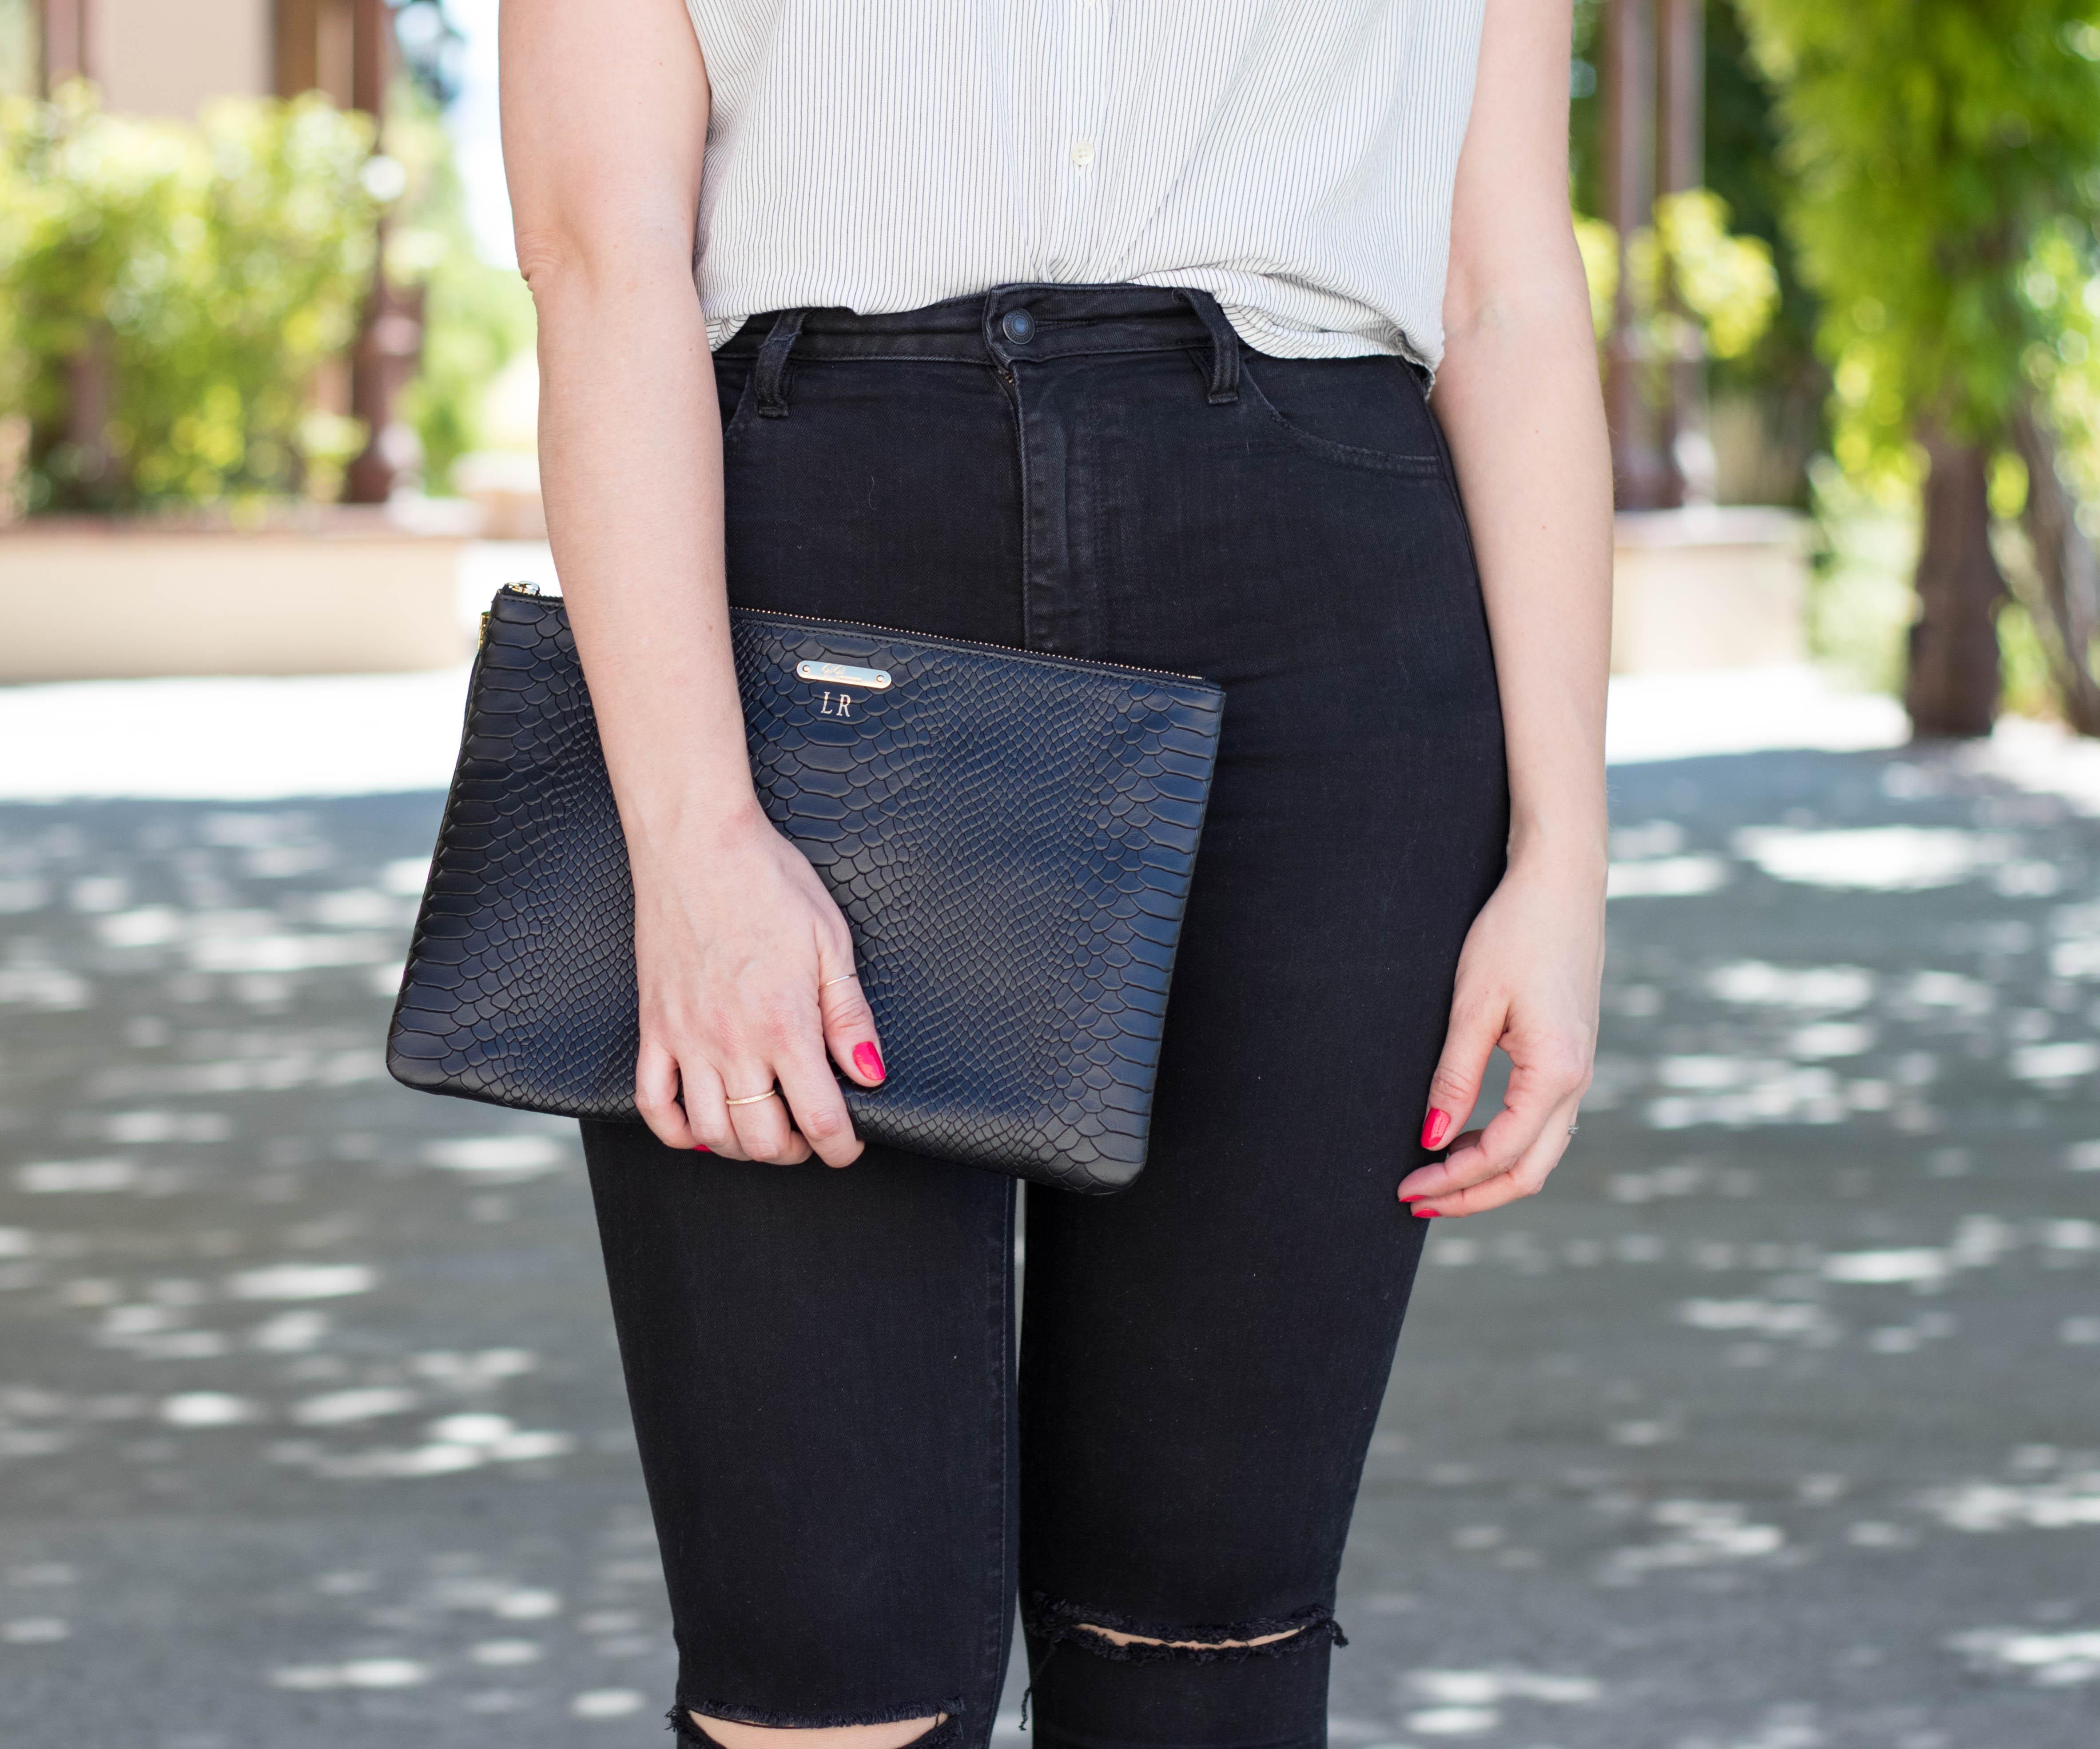 Gigi New York uber clutch #giginewyork #monogram #styleblogger